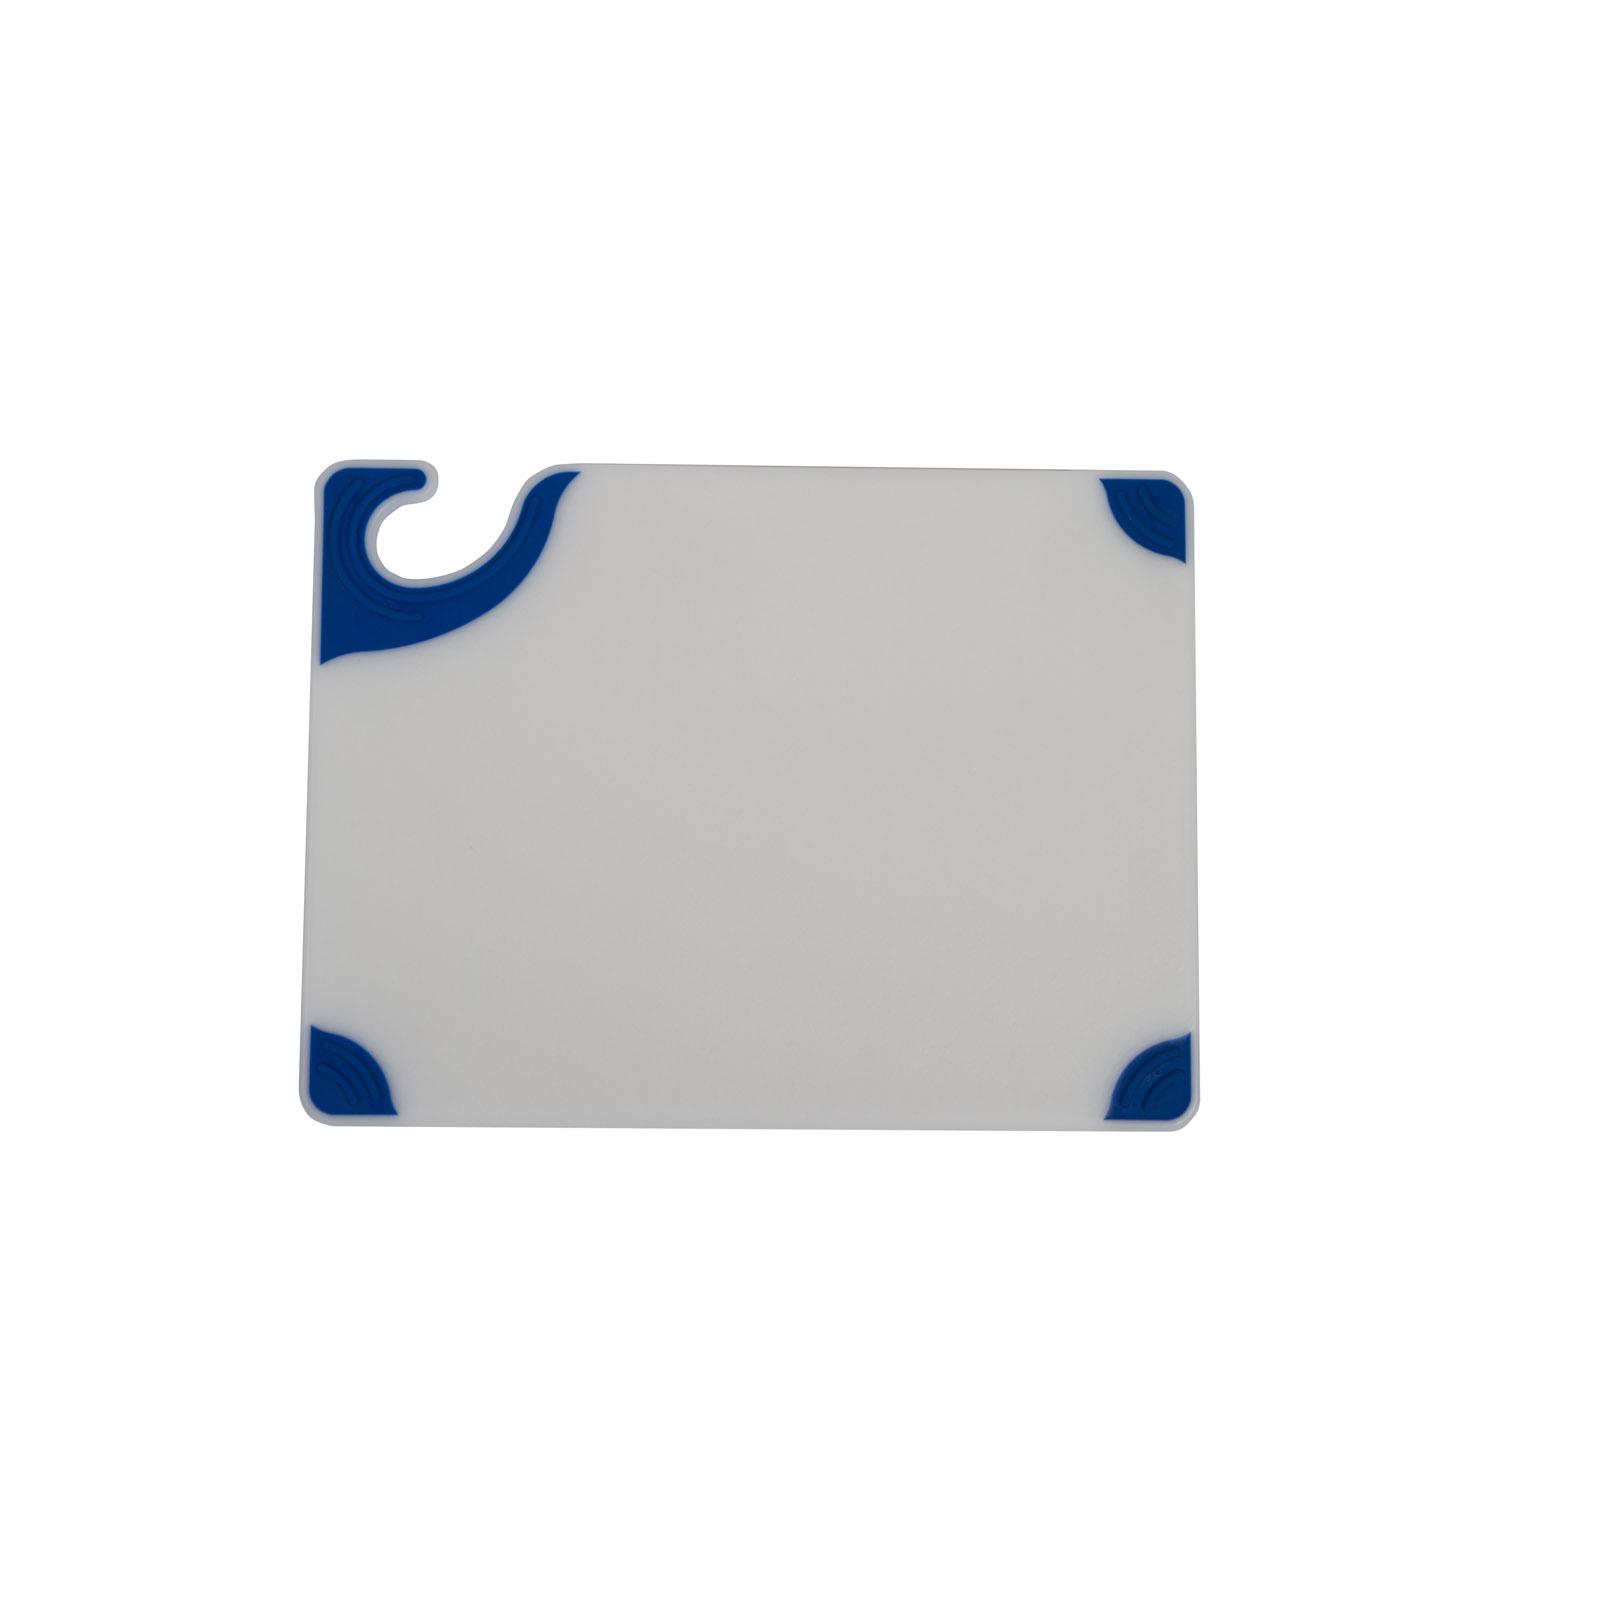 San Jamar CBGW912BL cutting board, plastic